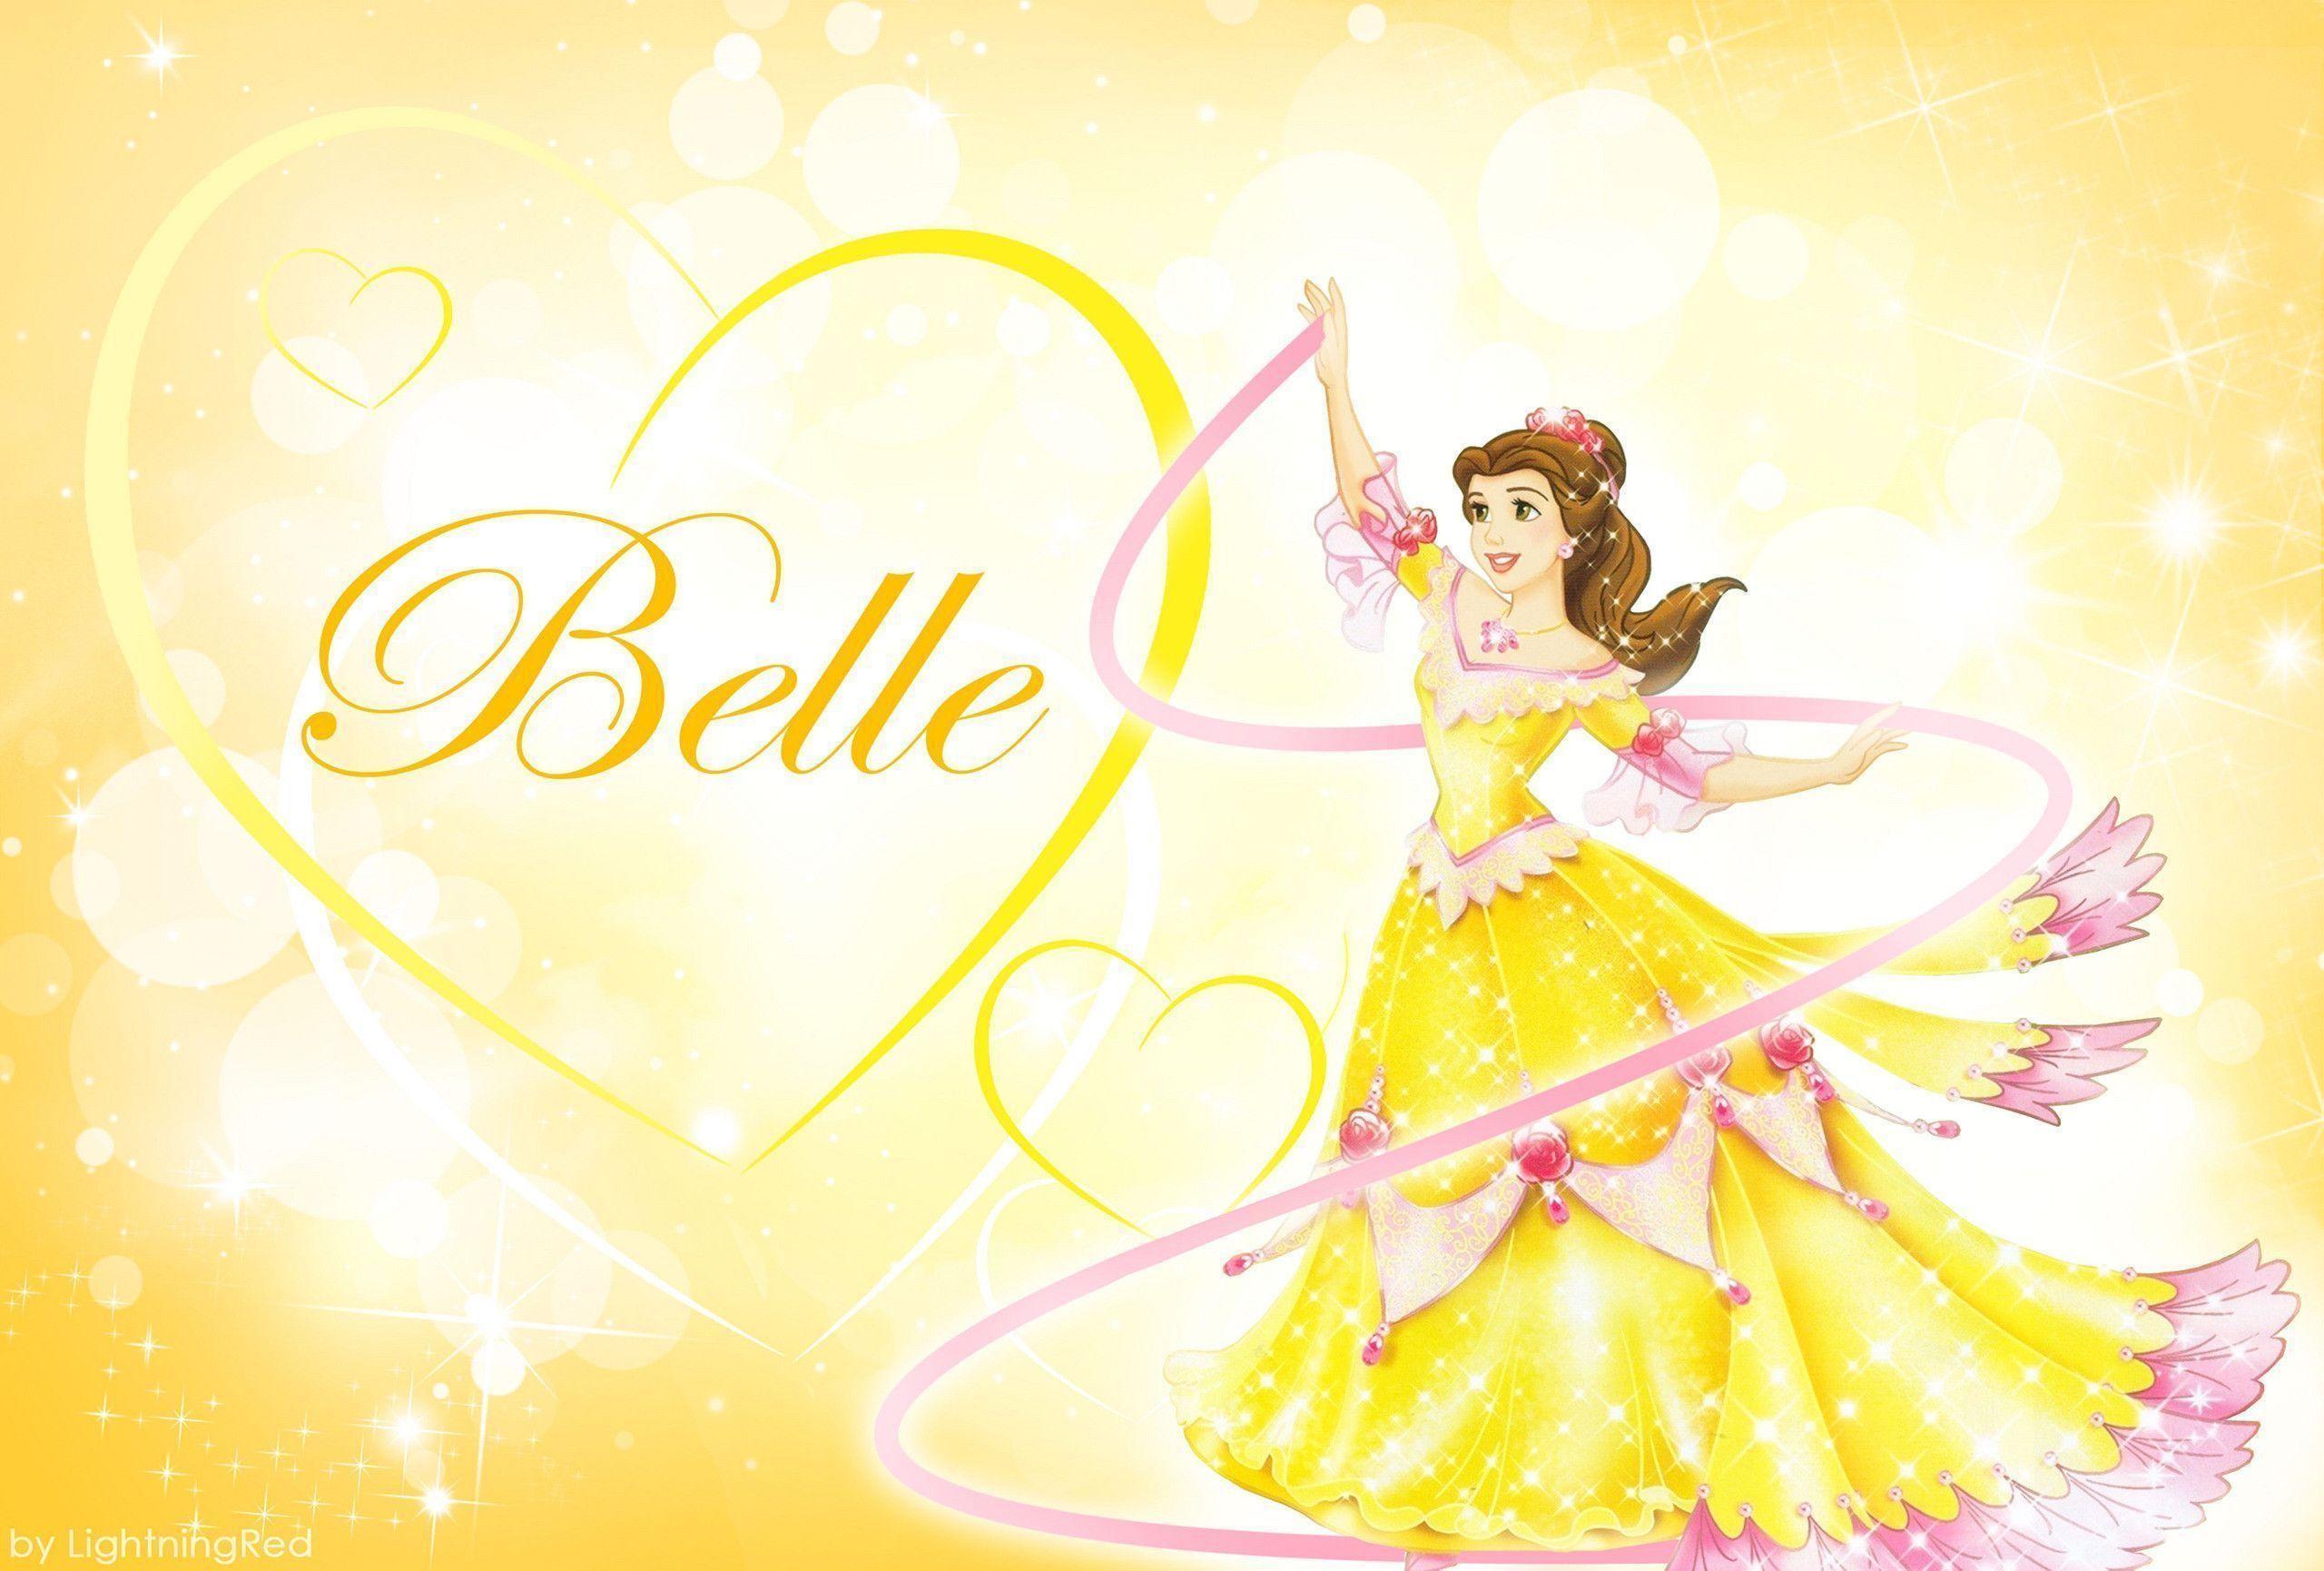 Res: 2560x1730, Yellow Belle Wallpaper - Disney Princess Fan Art (31653228) - Fanpop